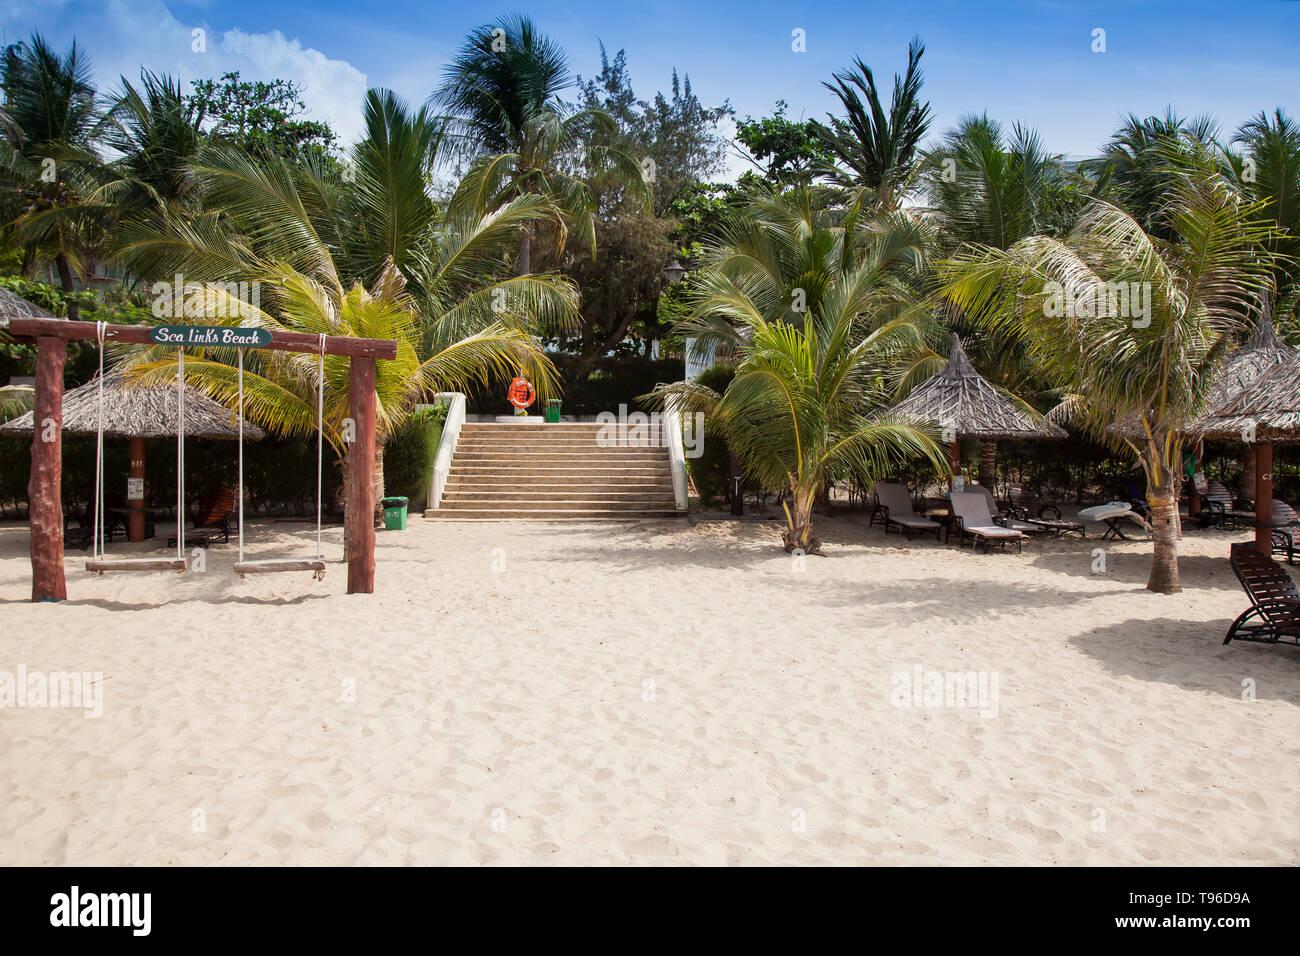 Palm Beach at the Sea Link Resort, Mui Ne, Vietnam, asia - Stock Image